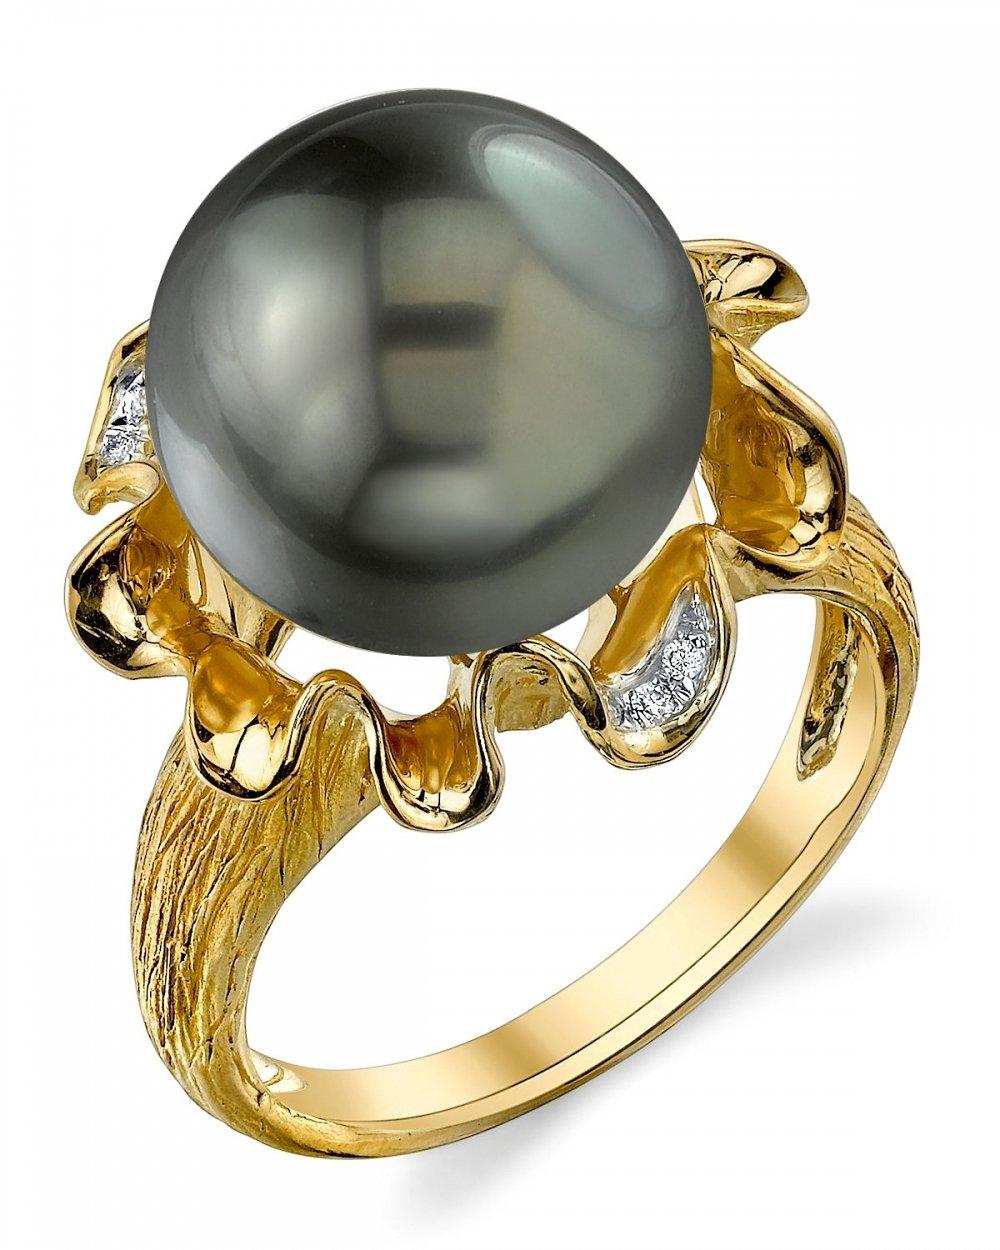 12mm Tahitian South Sea Cultured Pearl & Diamond Robin Ring in 14K Gold